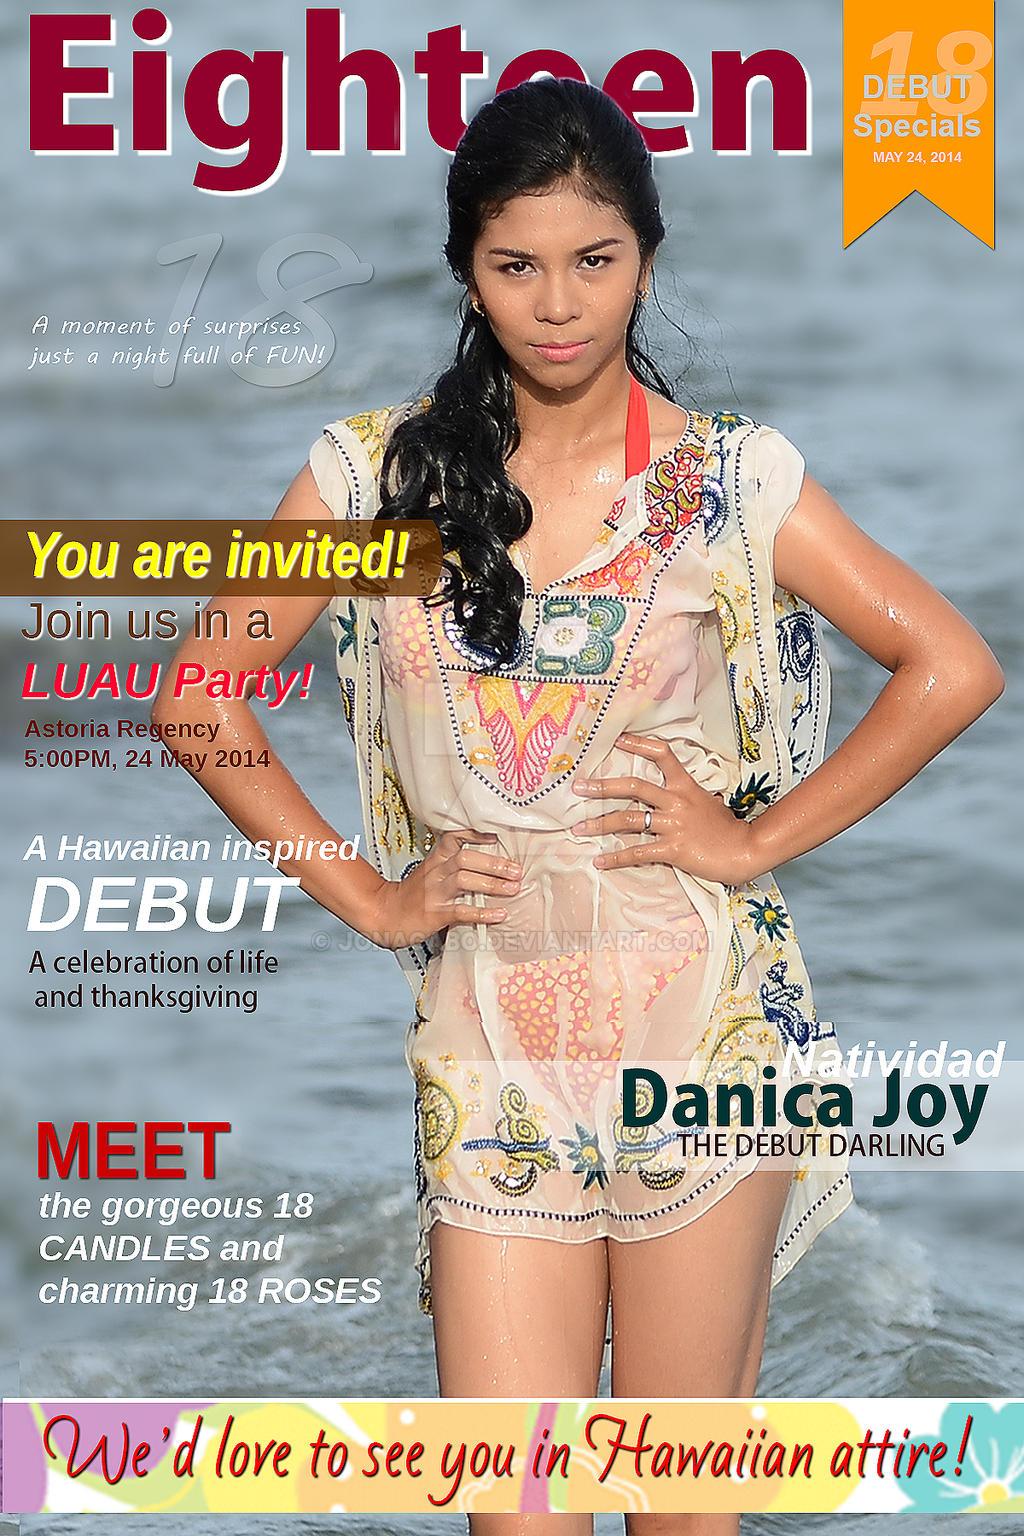 Debut Invitation Sample (Magazine Style) by JonAcabo on DeviantArt